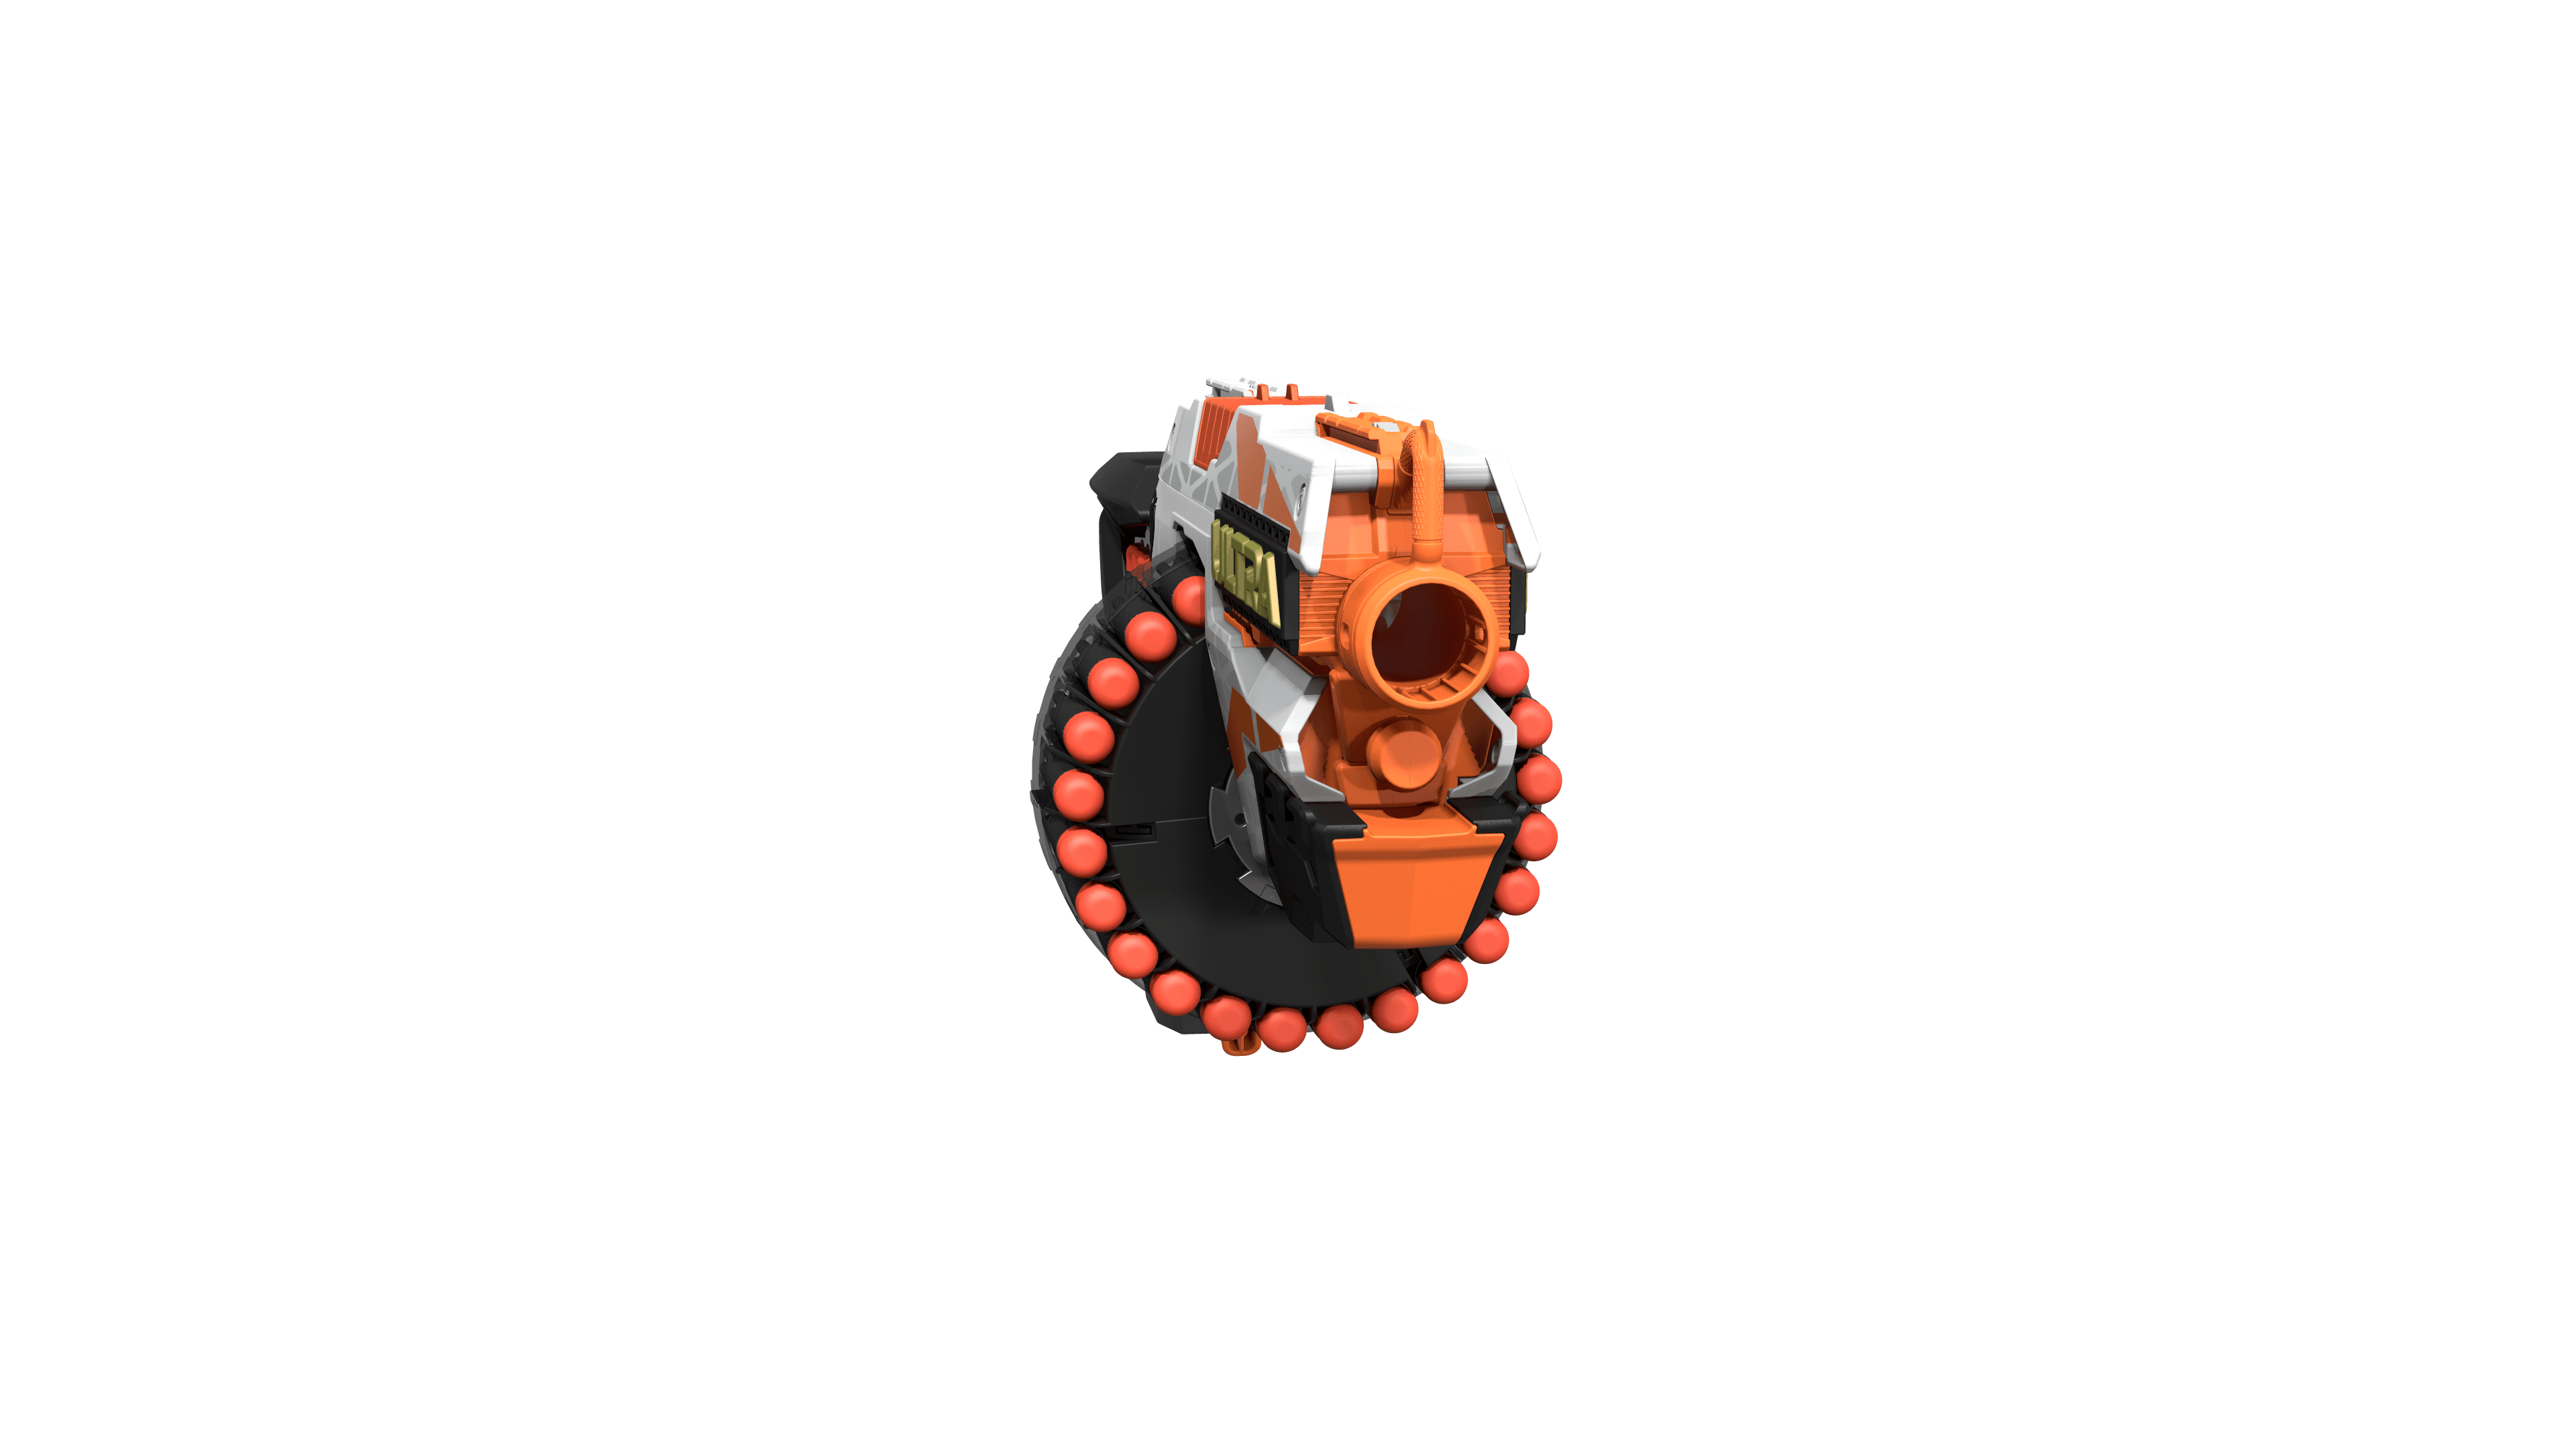 ultra blaster img 94